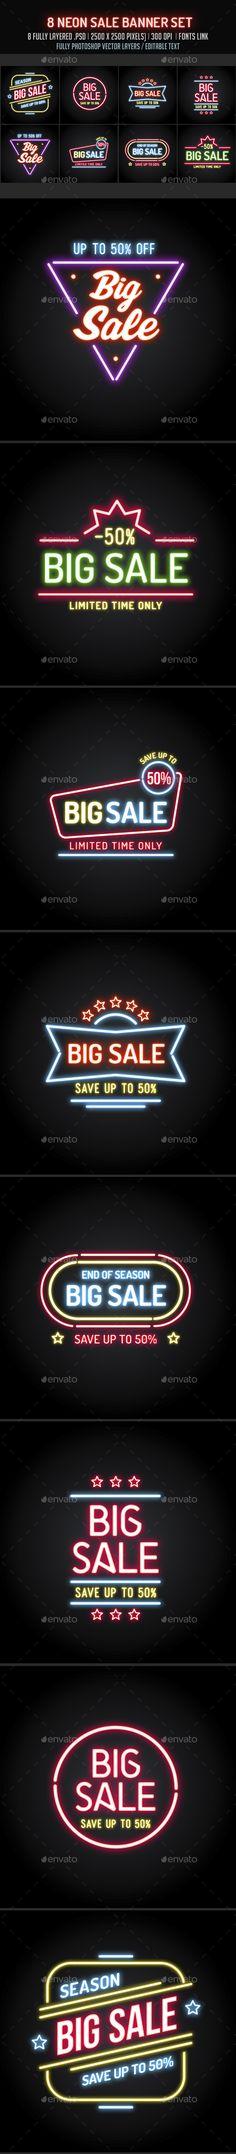 Neon Sale Banners Set — Photoshop PSD #web • Download ➝ https://graphicriver.net/item/neon-sale-banners-set/19496999?ref=pxcr